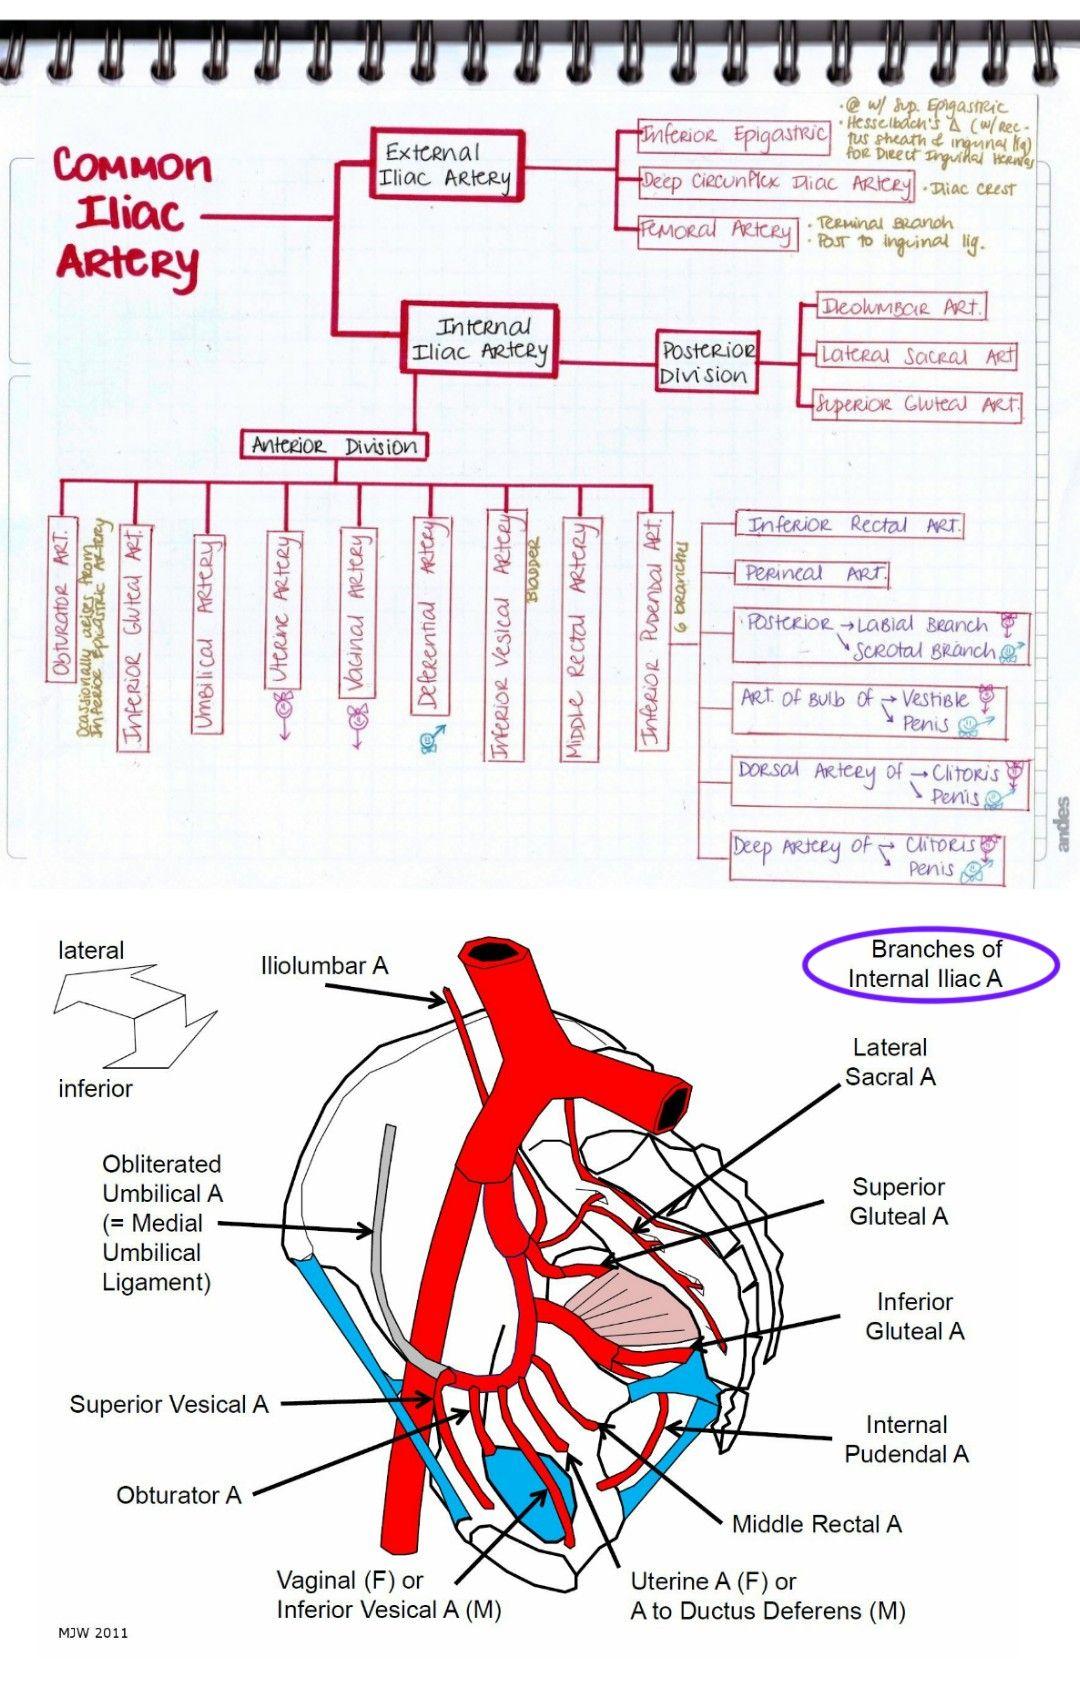 Branches Of Iliac Artery